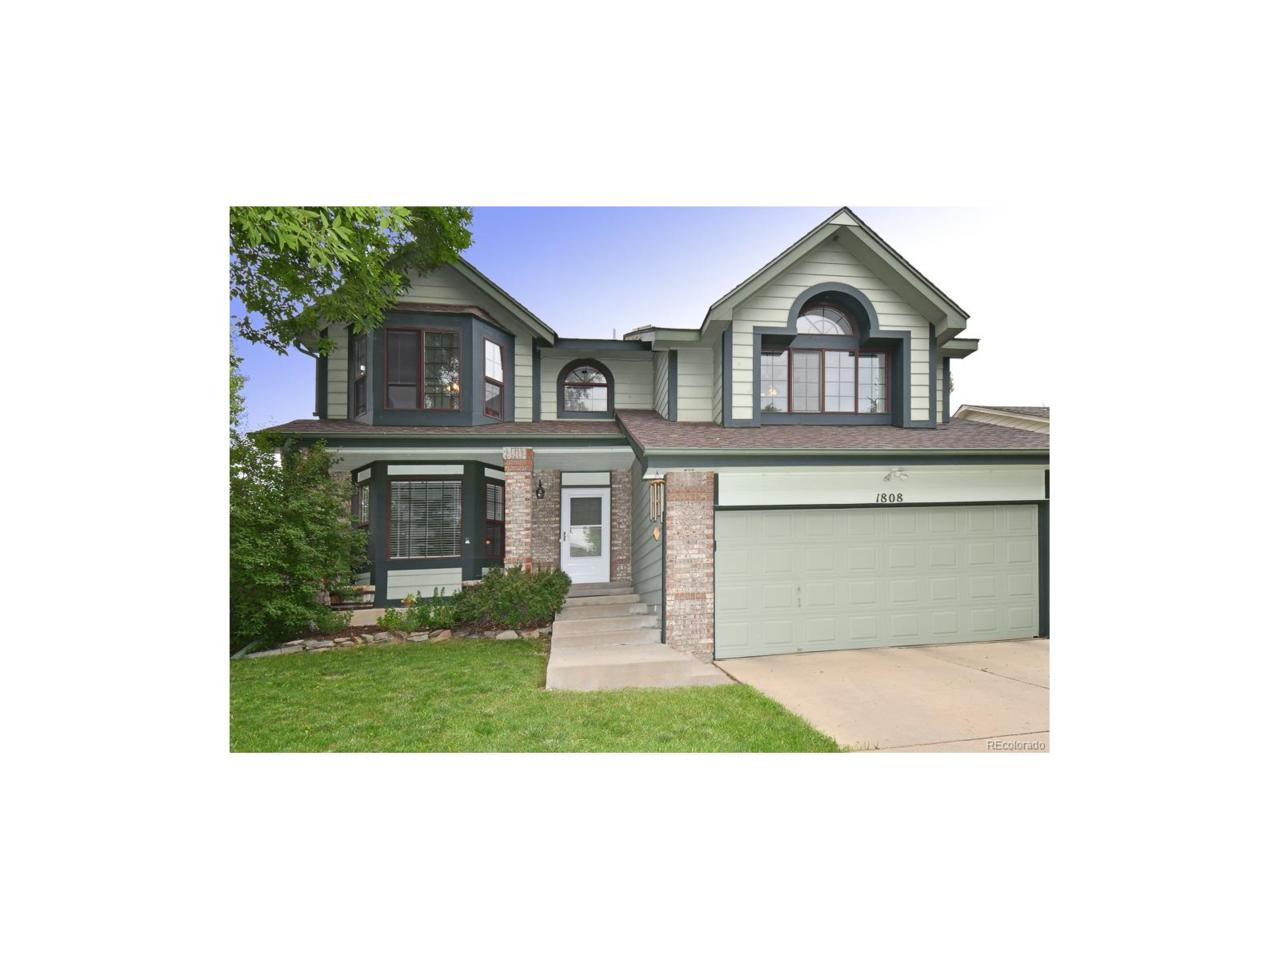 1808 20th Avenue, Longmont, CO 80501 (MLS #9414255) :: 8z Real Estate